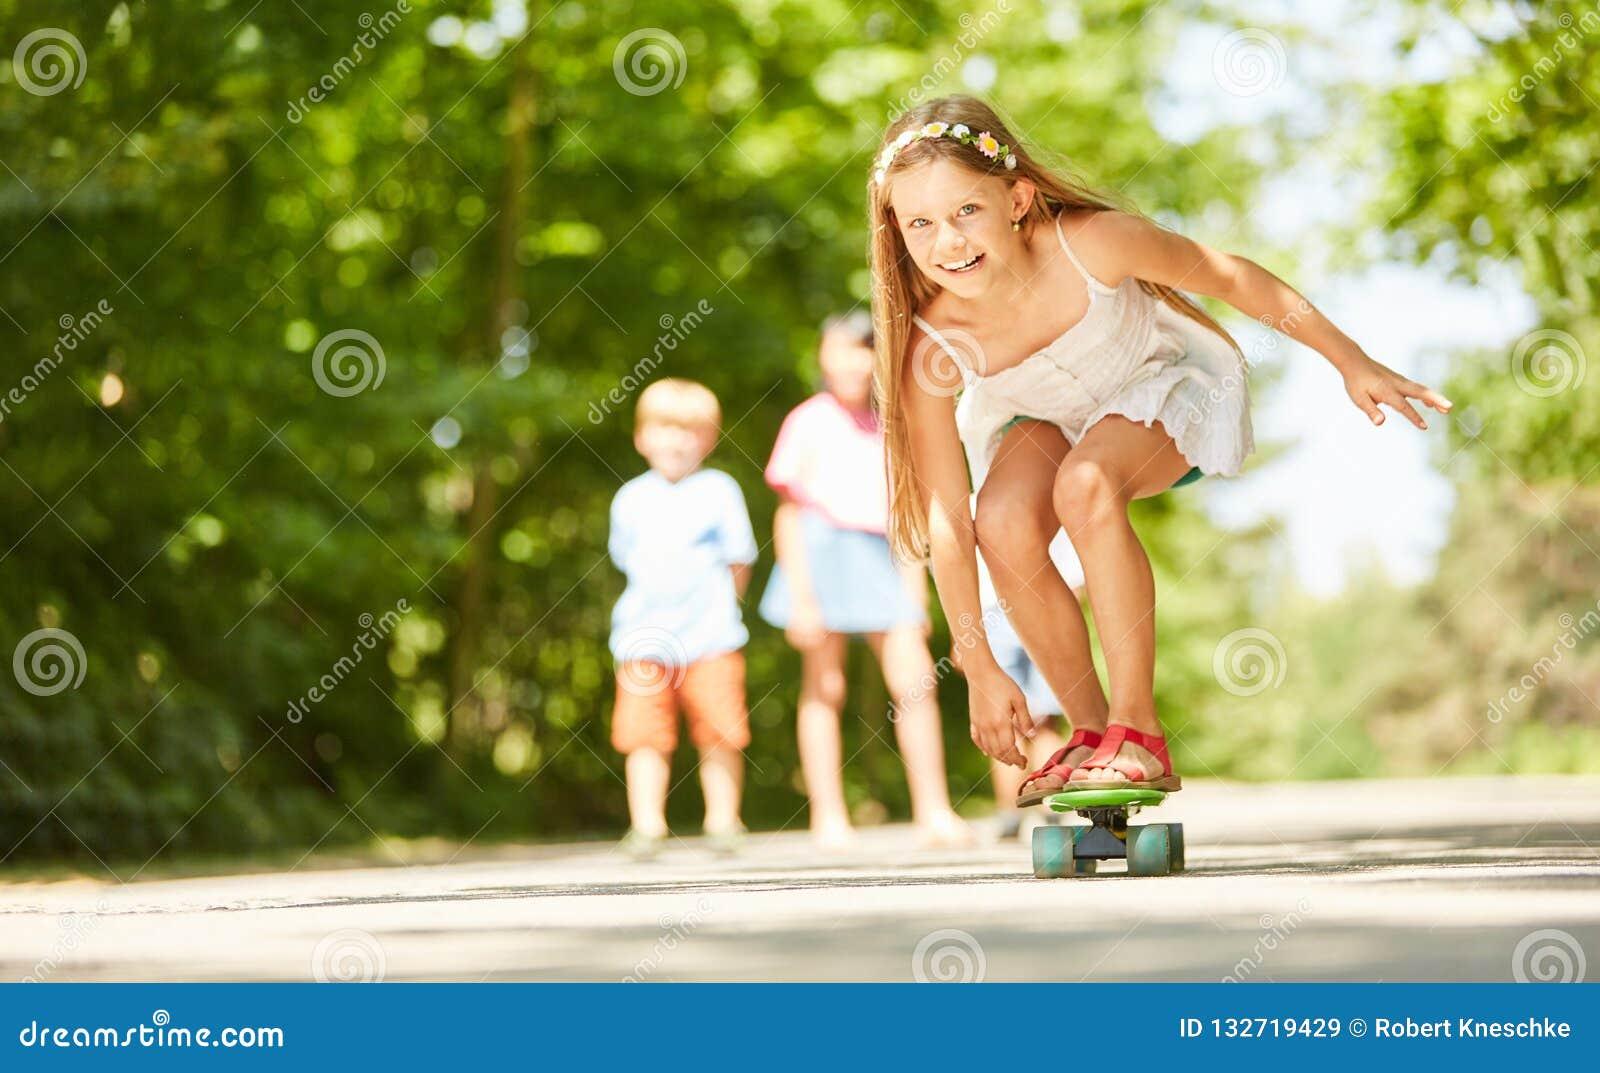 Girl is having fun while skateboarding